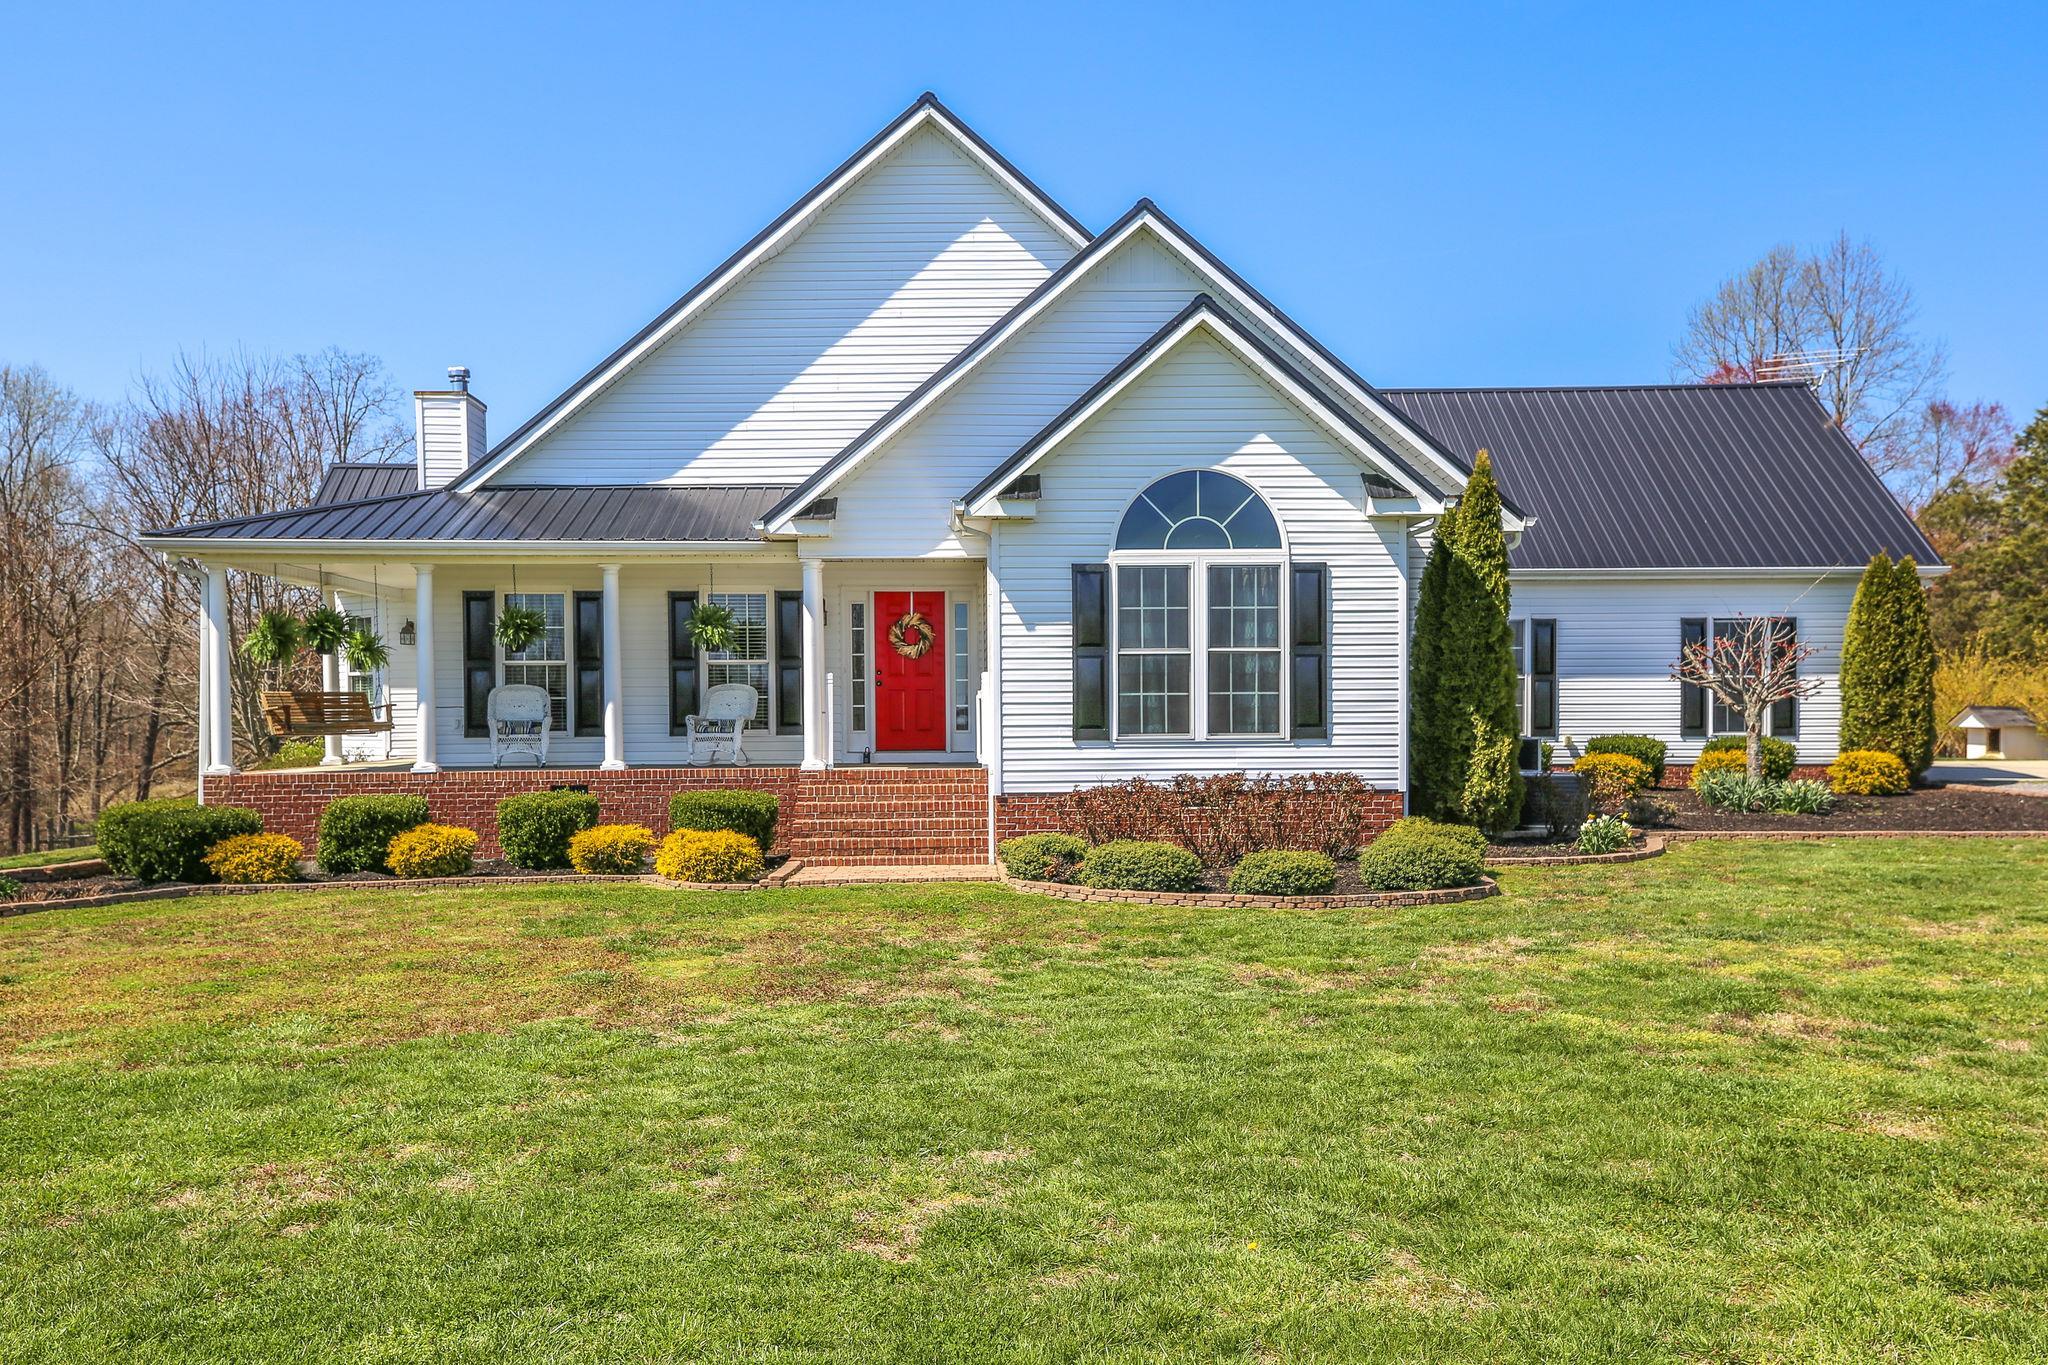 181 Willow Lake Dr, Woodbury, TN 37190 - Woodbury, TN real estate listing